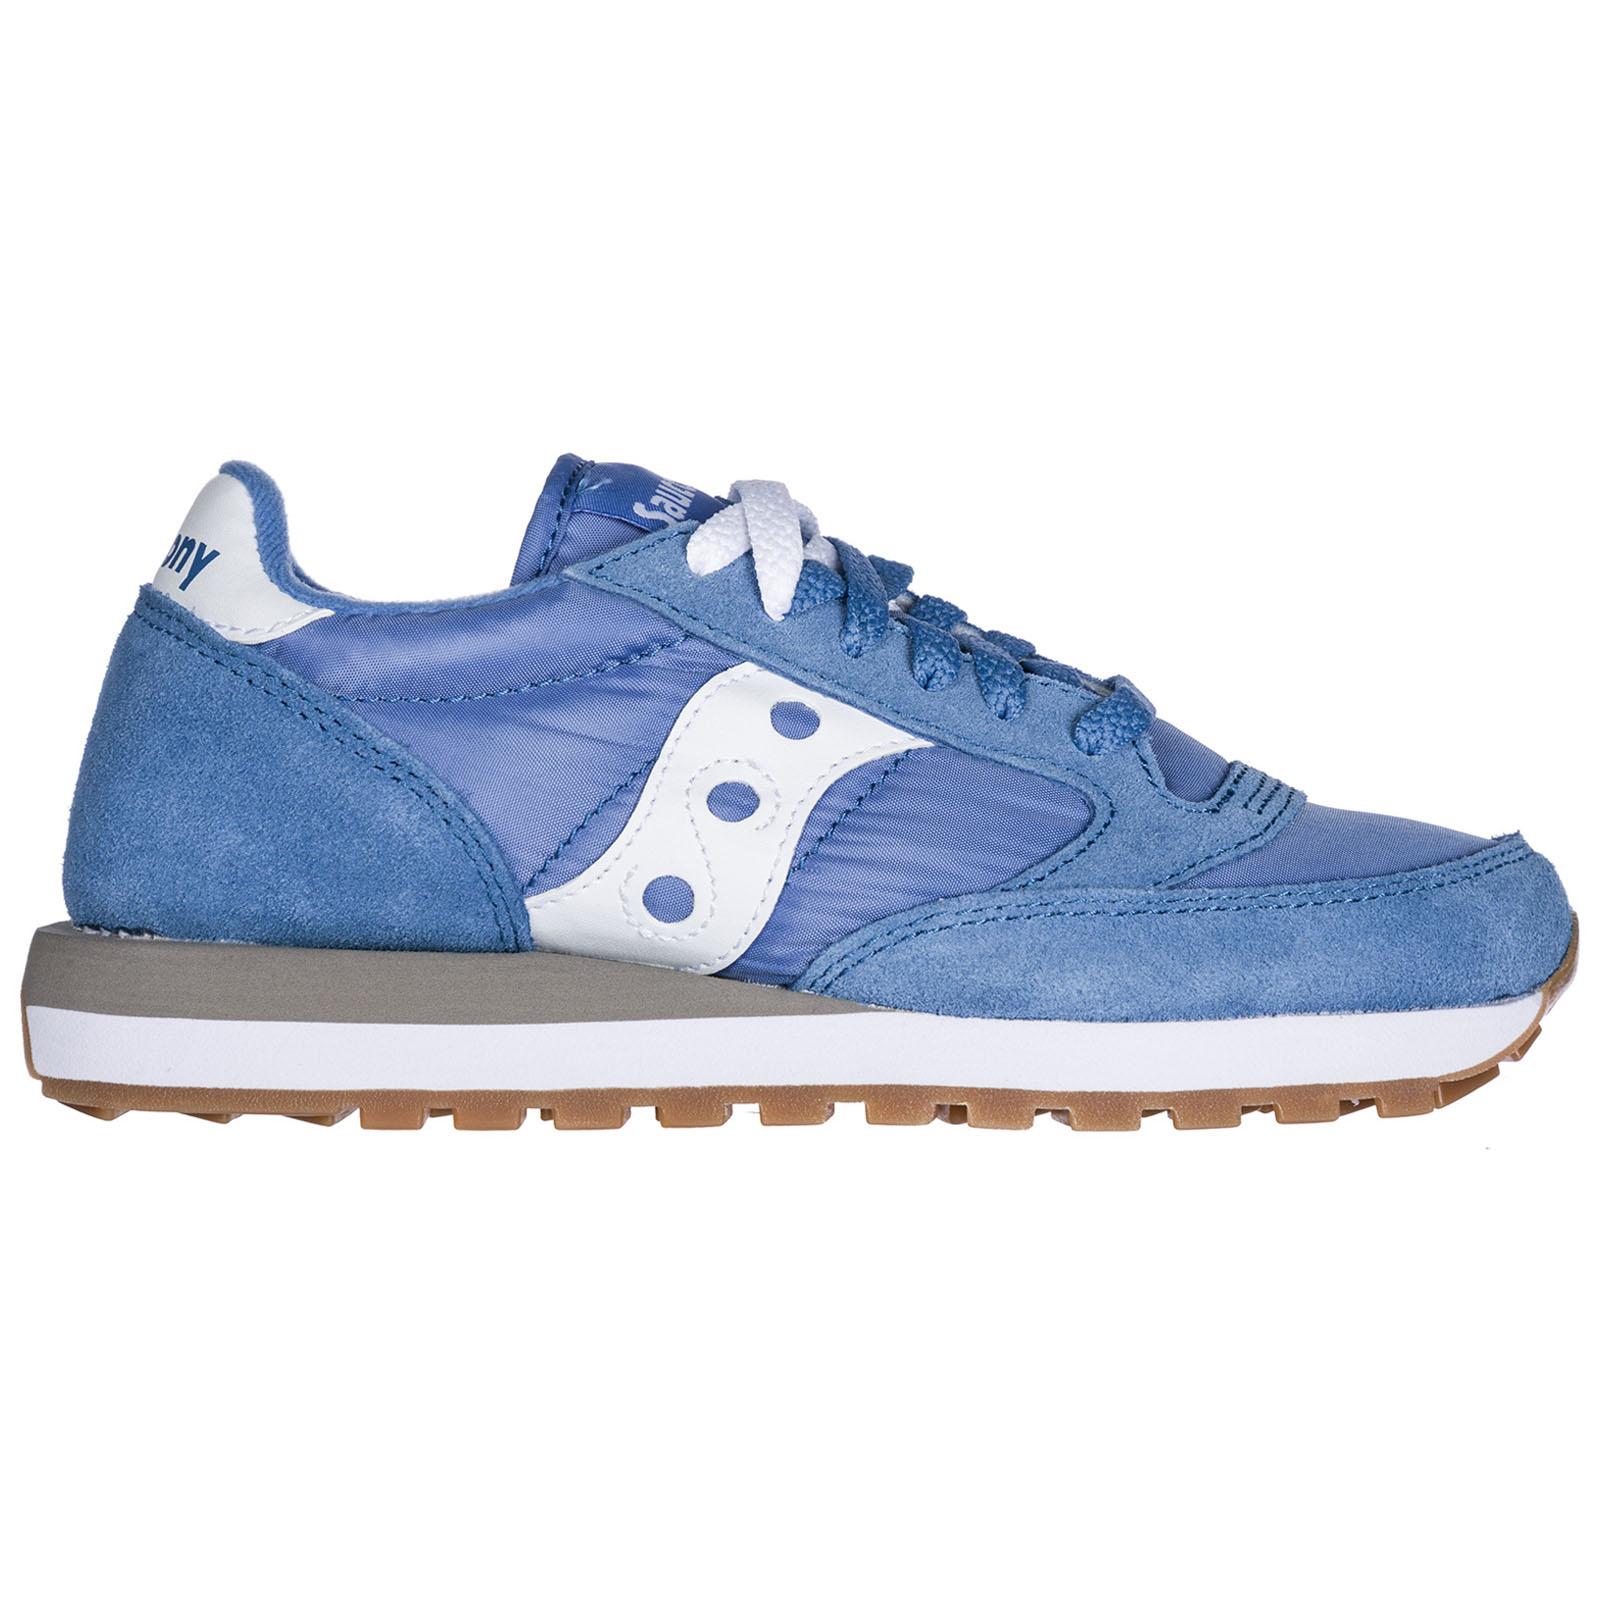 reputable site c990b 9f9c6 Chaussures baskets sneakers femme en daim jazz original ...